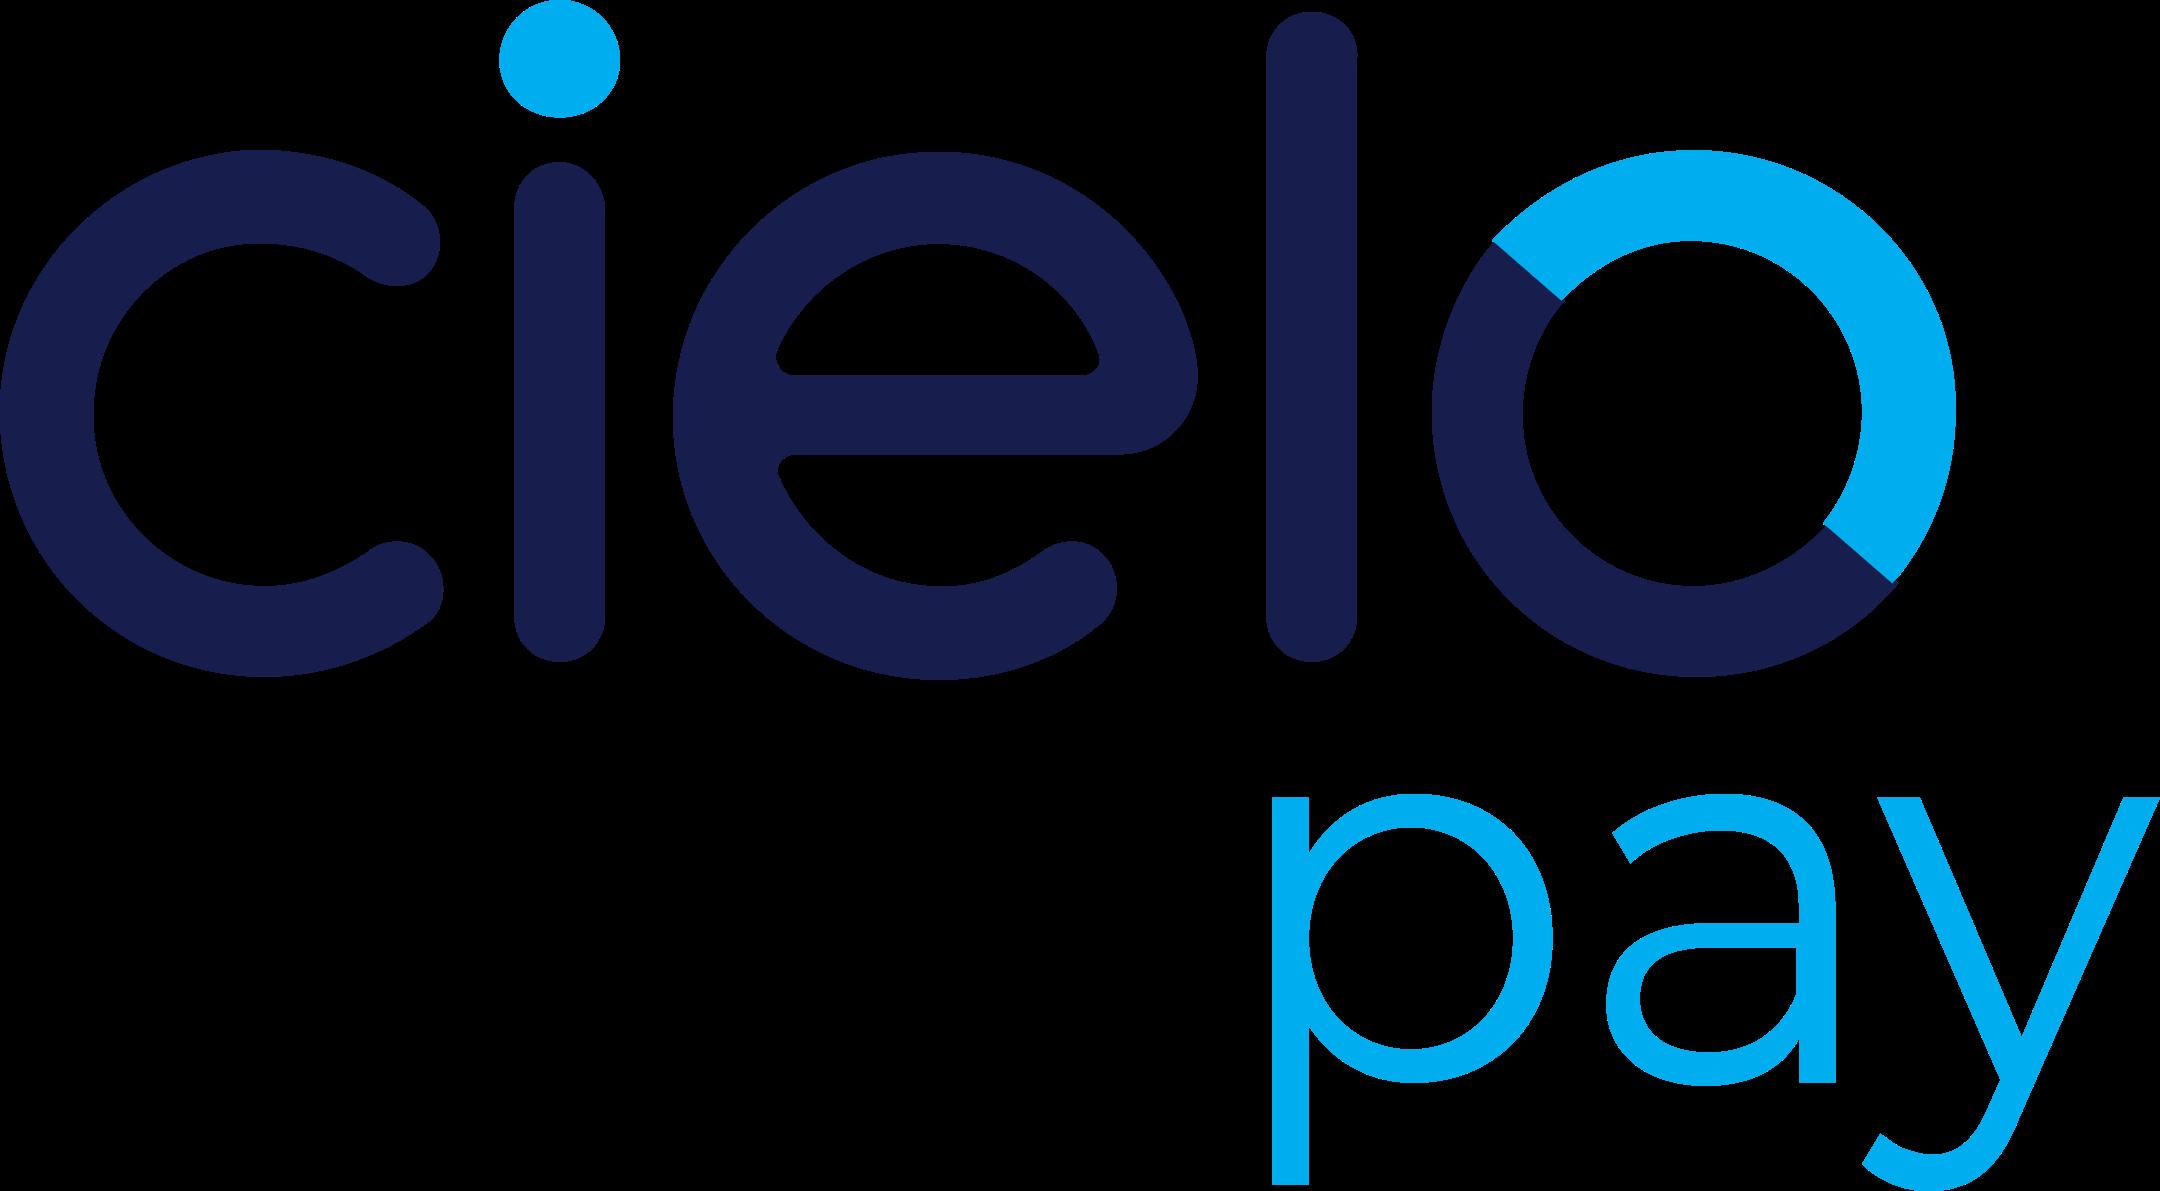 cielo pay logo 1 - Cielo Pay Logo